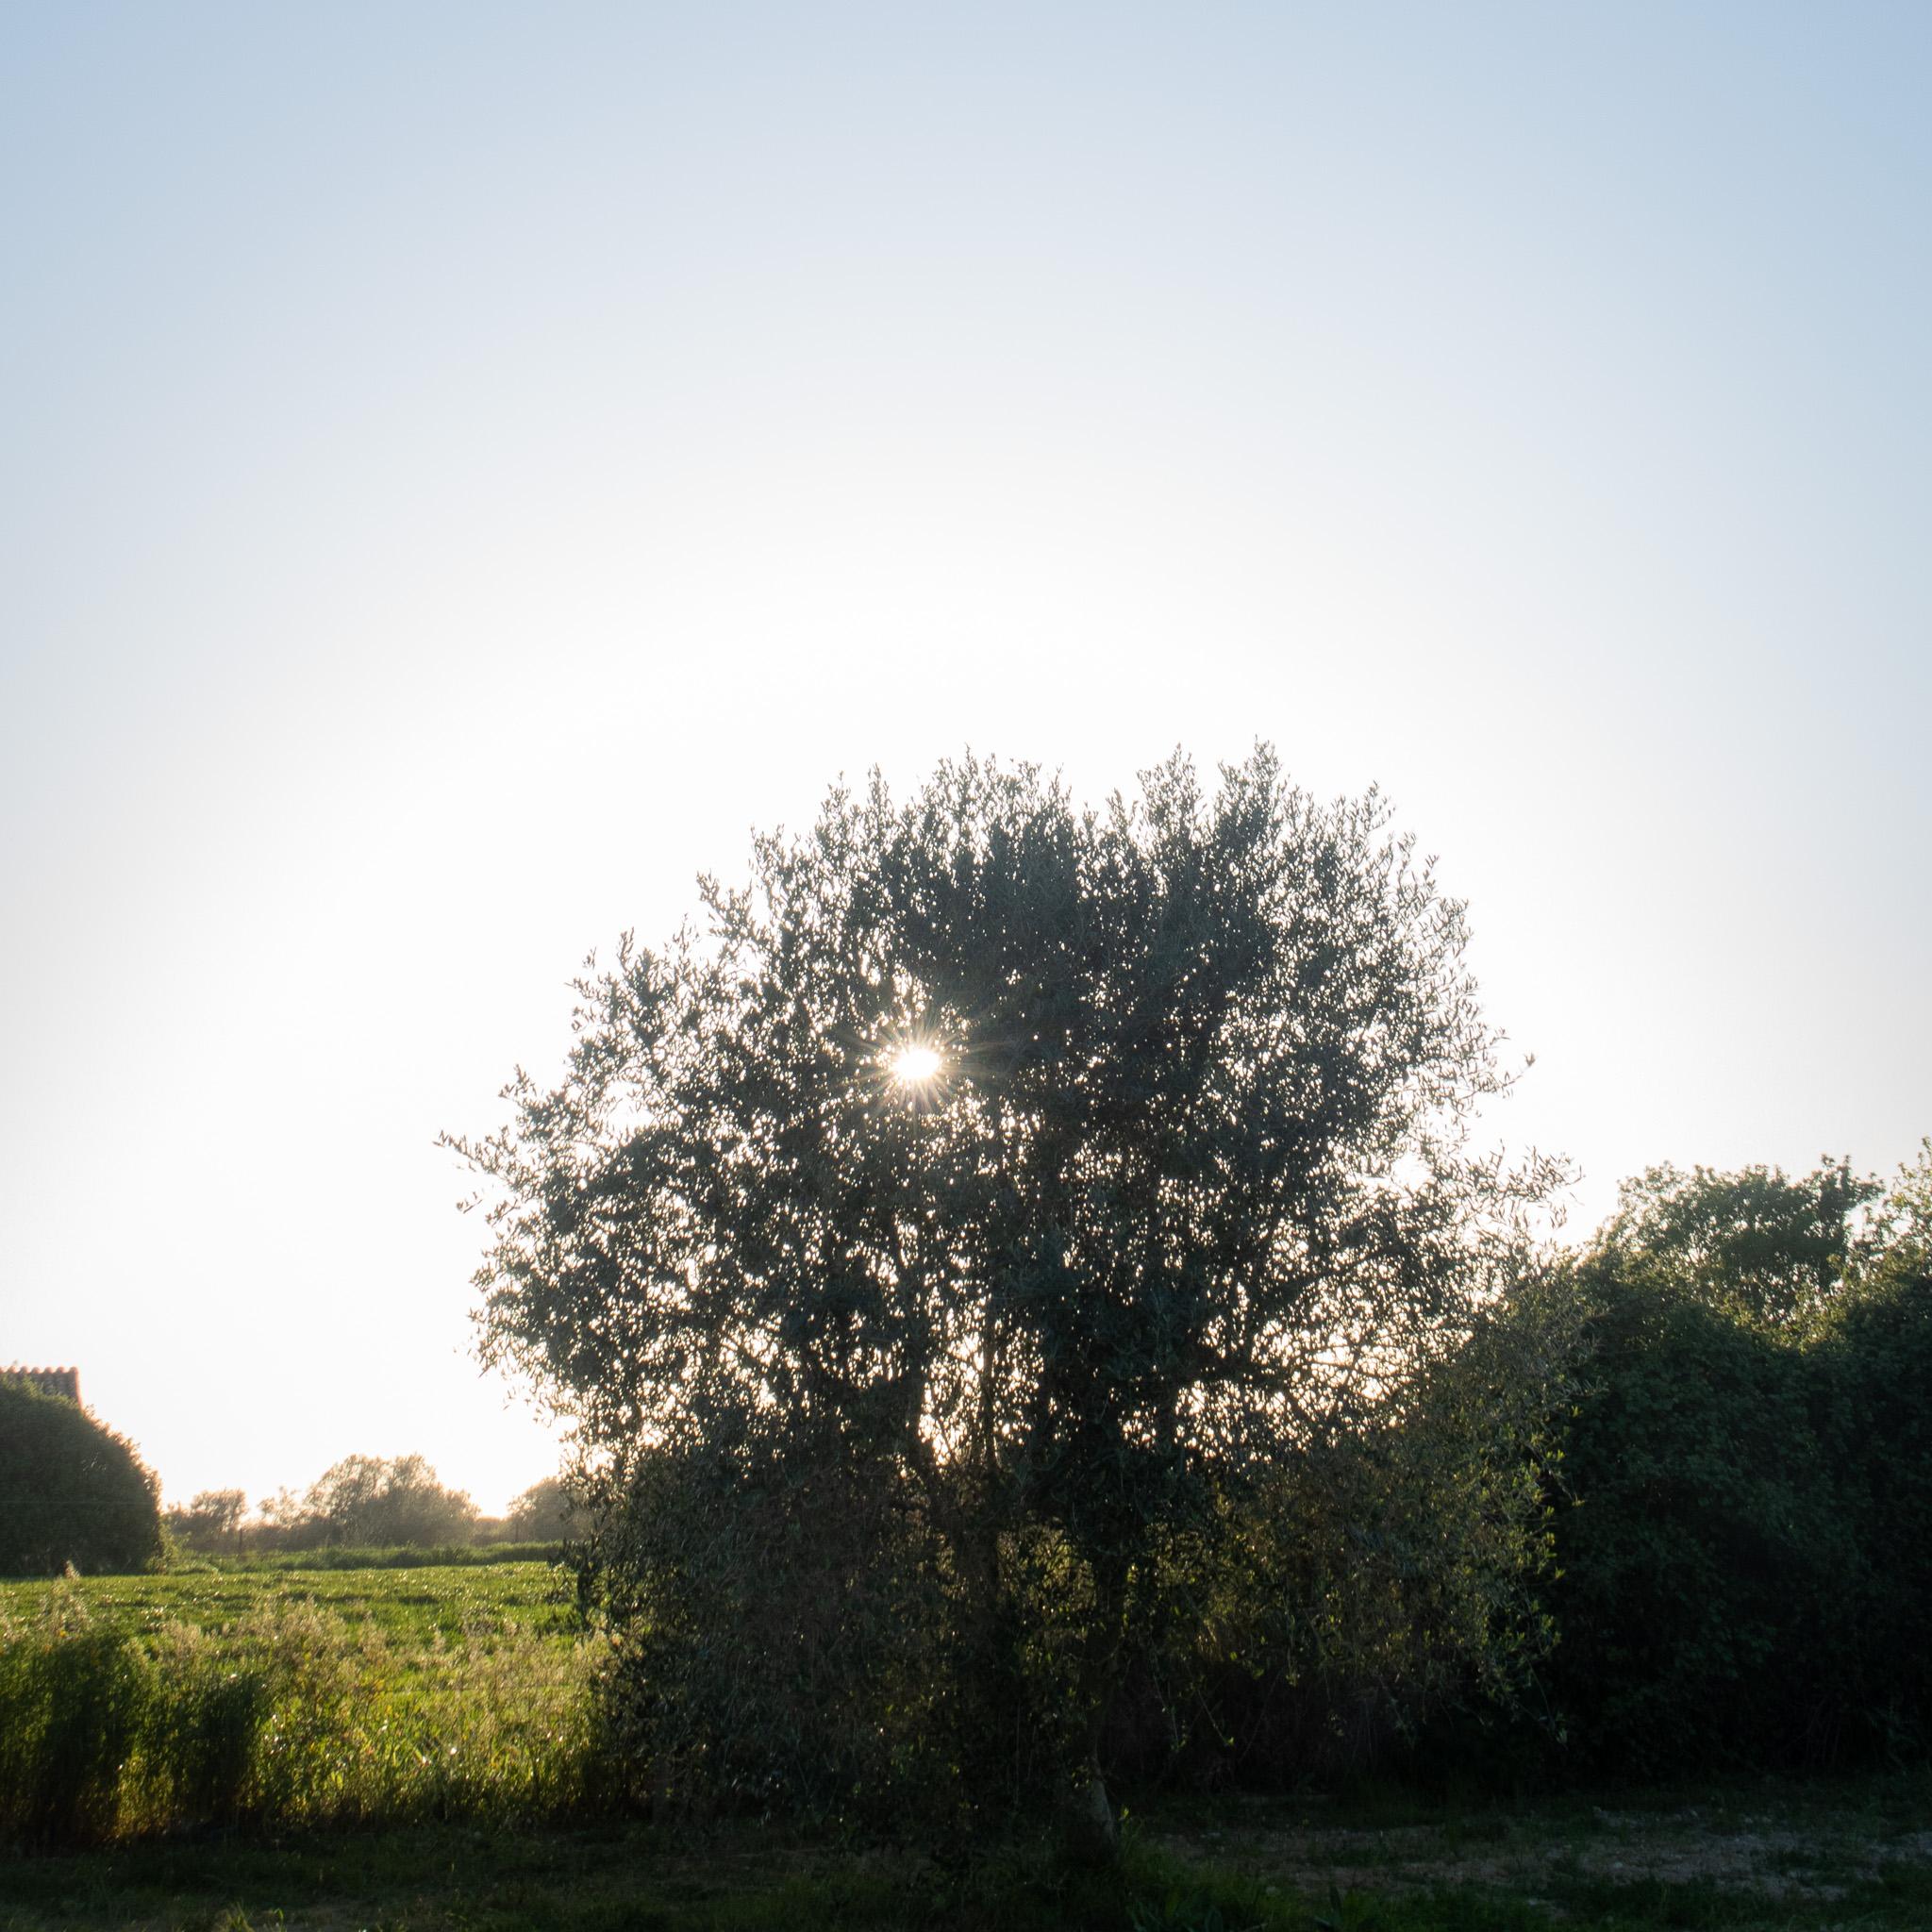 ida-carr-blogg-2-9.jpg